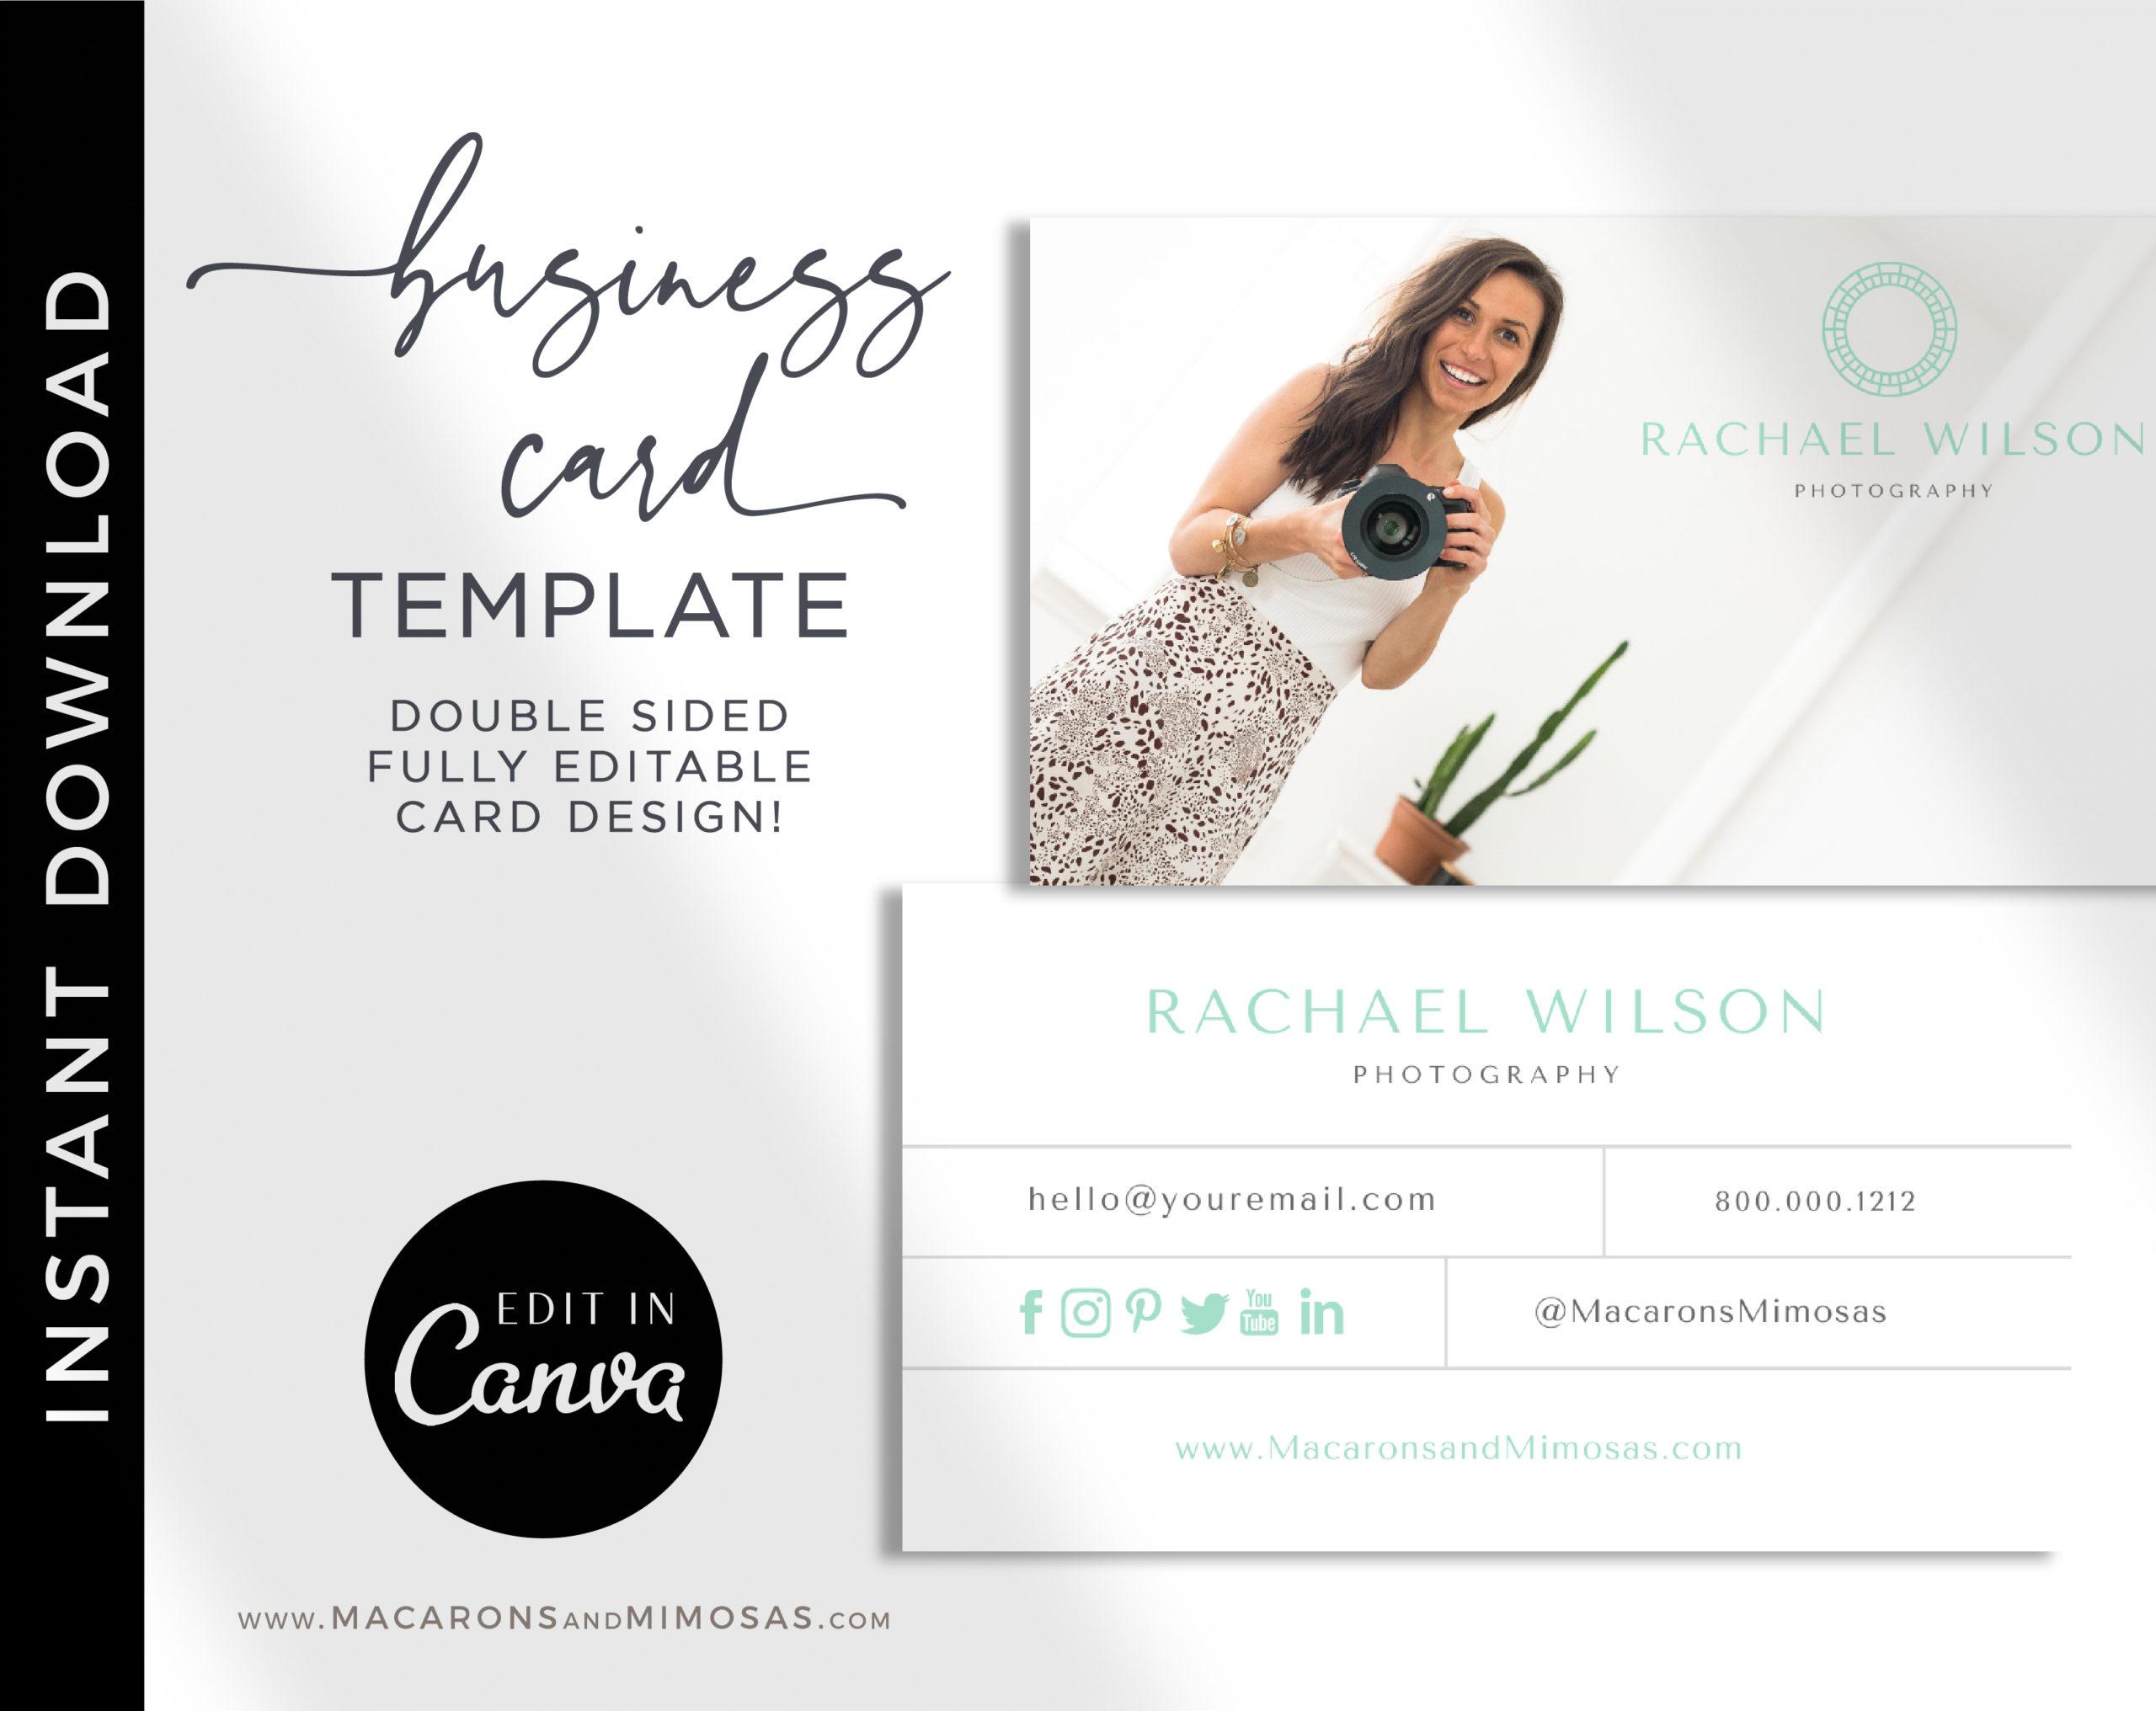 custom business card 200 business cards Premade Business Card Design Photography business card template Business Card Template